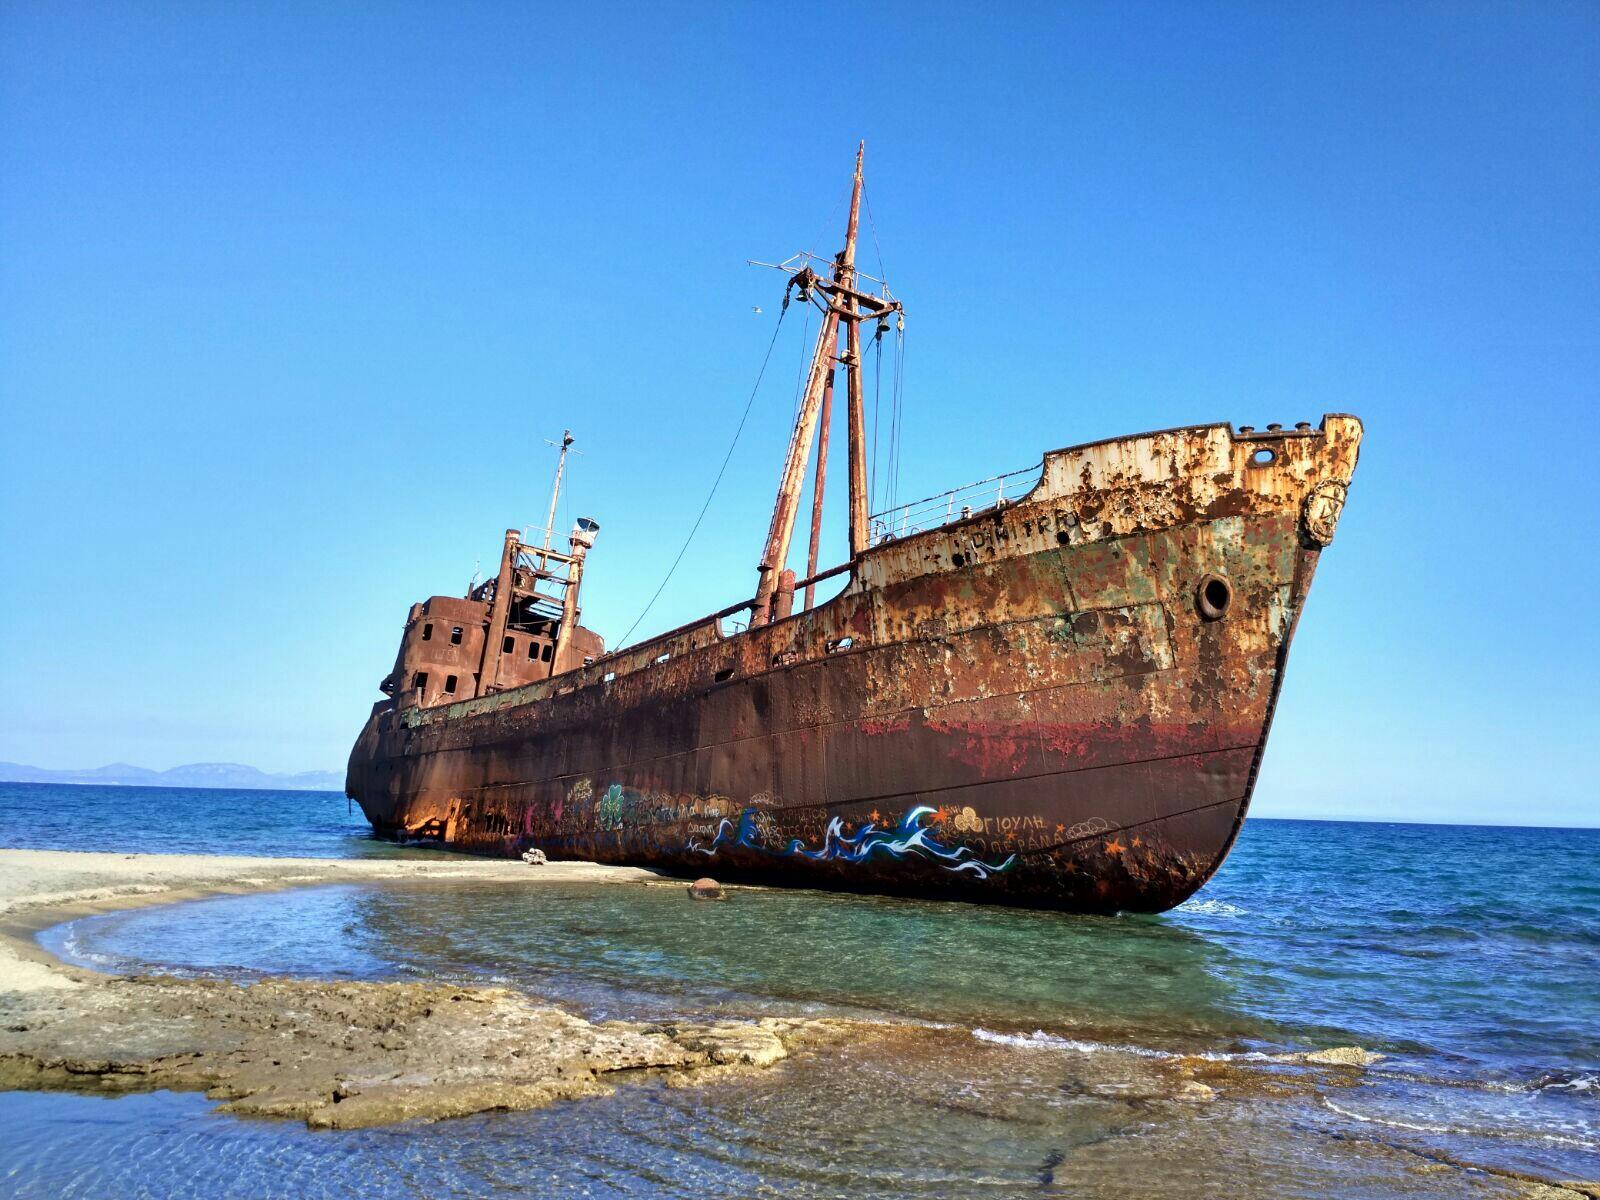 A rusty shipwreck in gytheion, greece   Abandoned   Pinterest ...